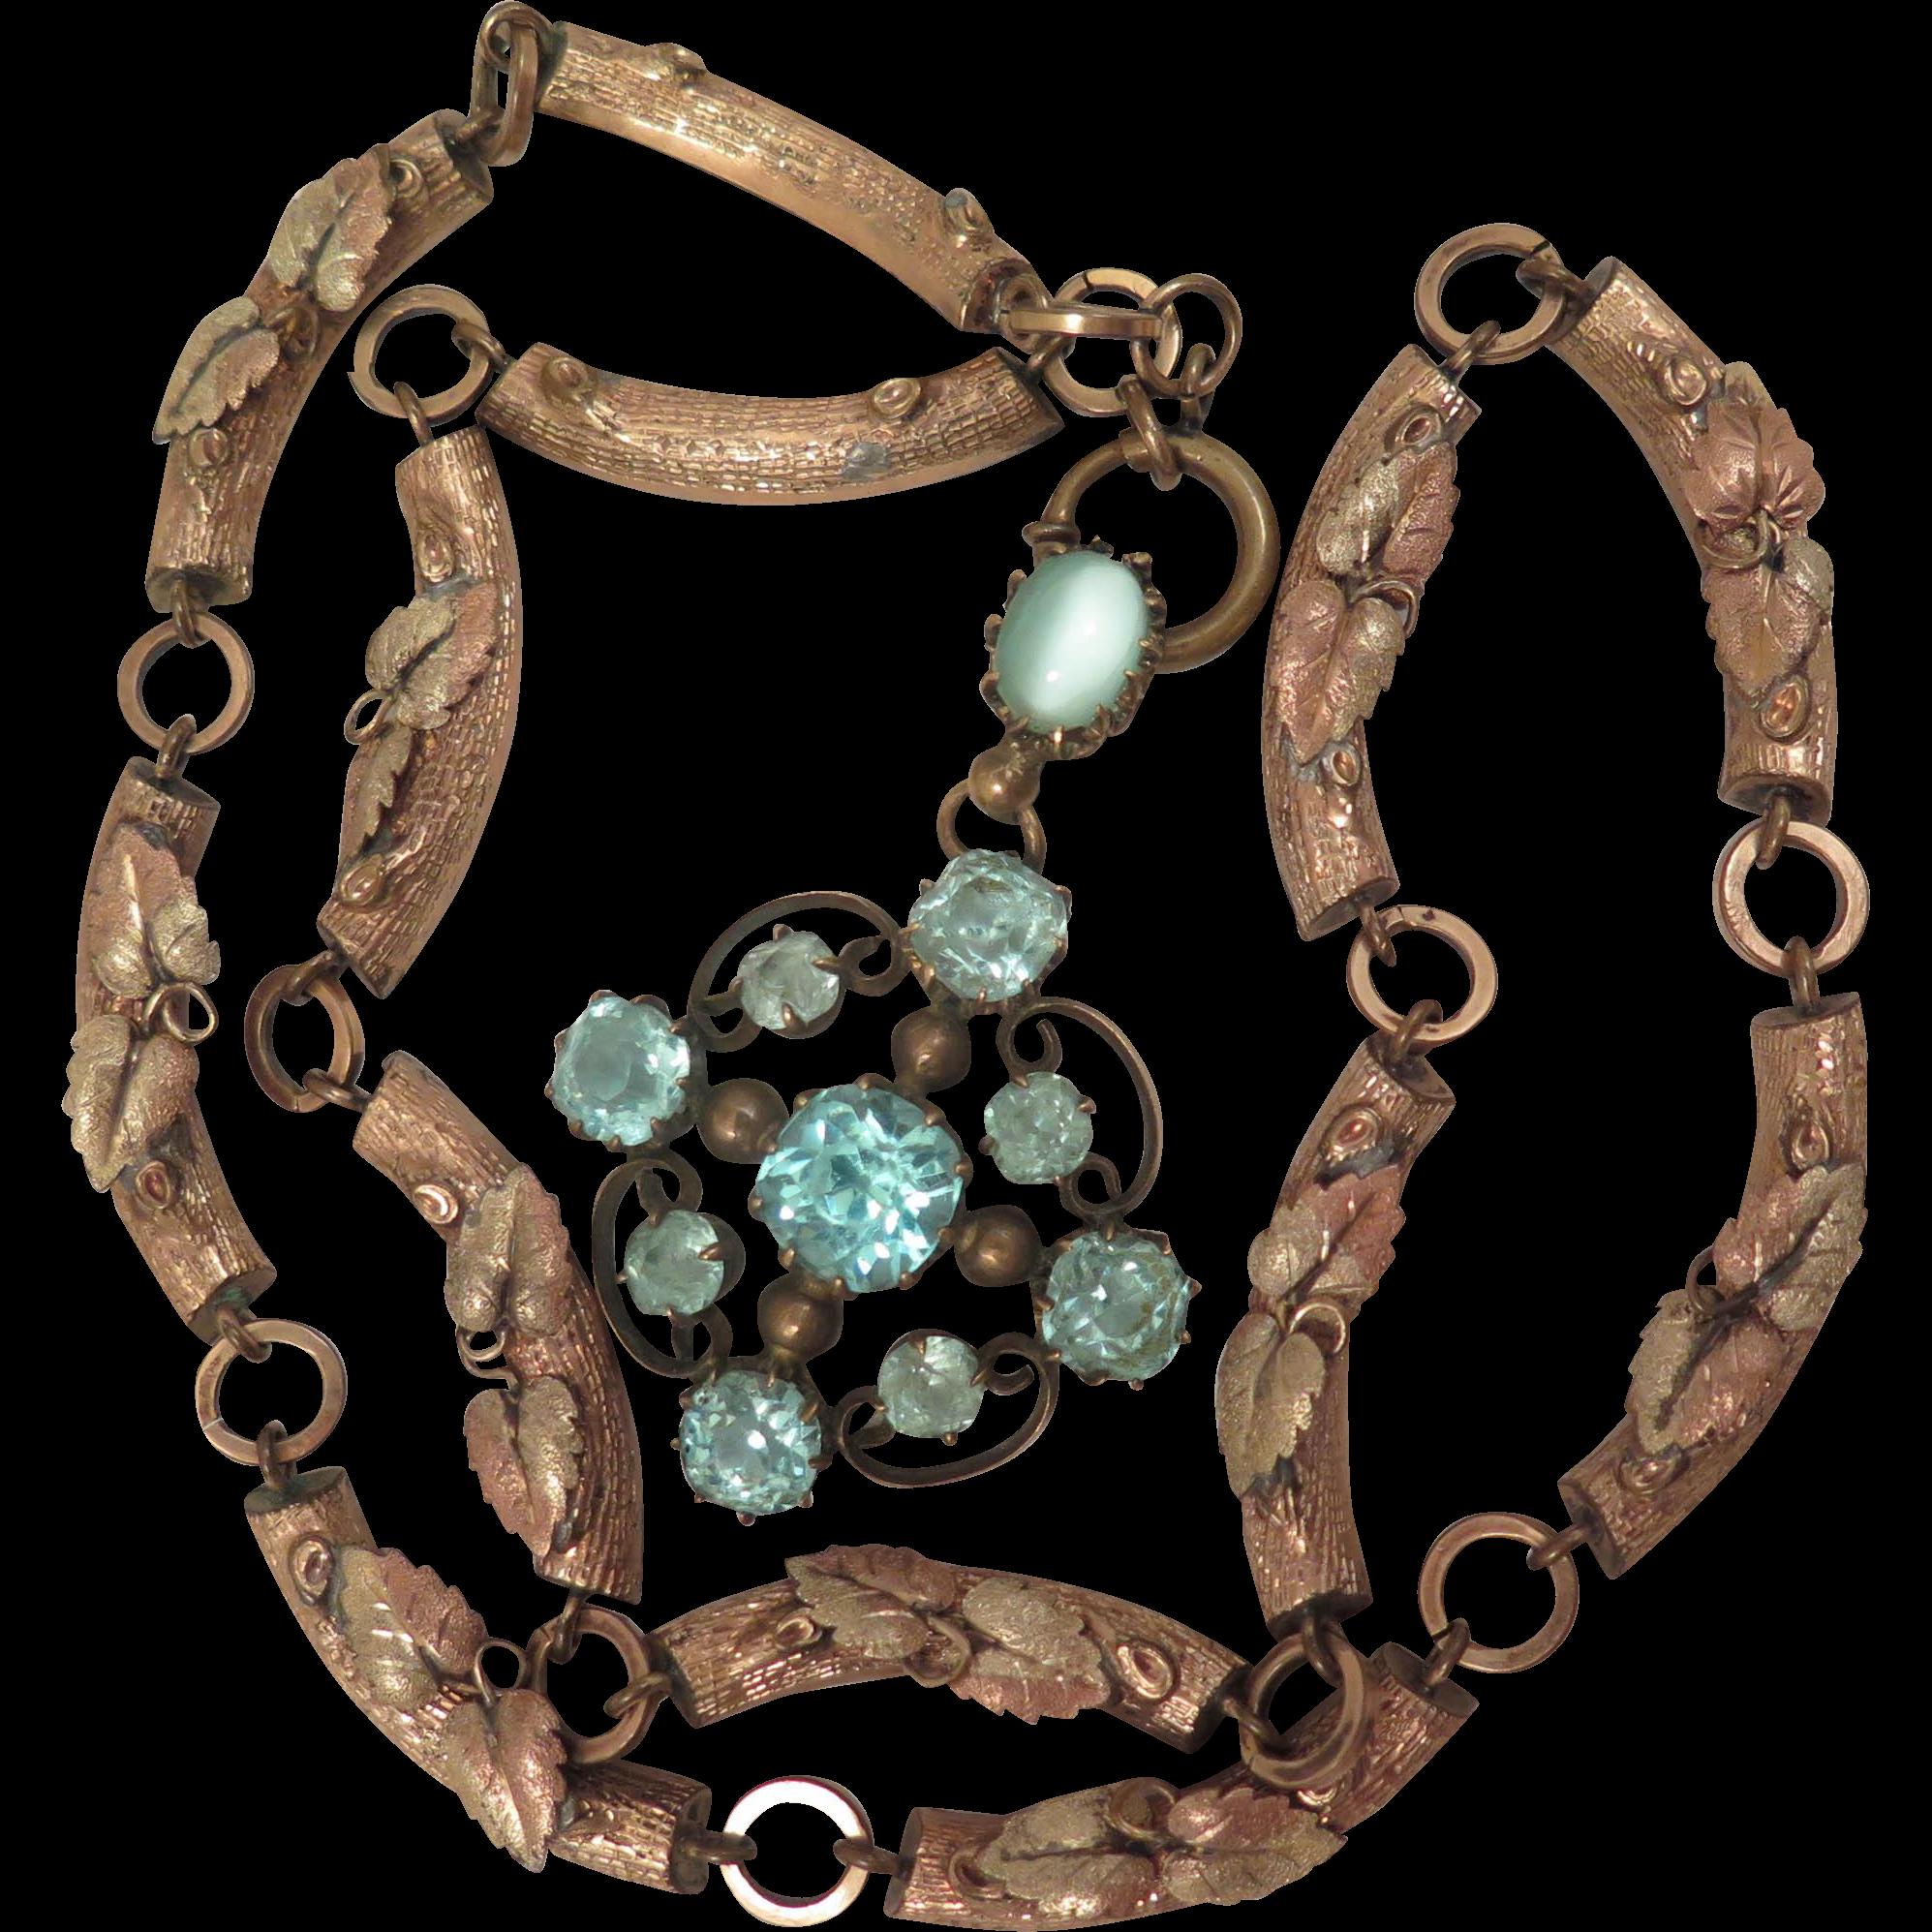 Victorian Fancy Necklace Chain with Blue Paste Pendant